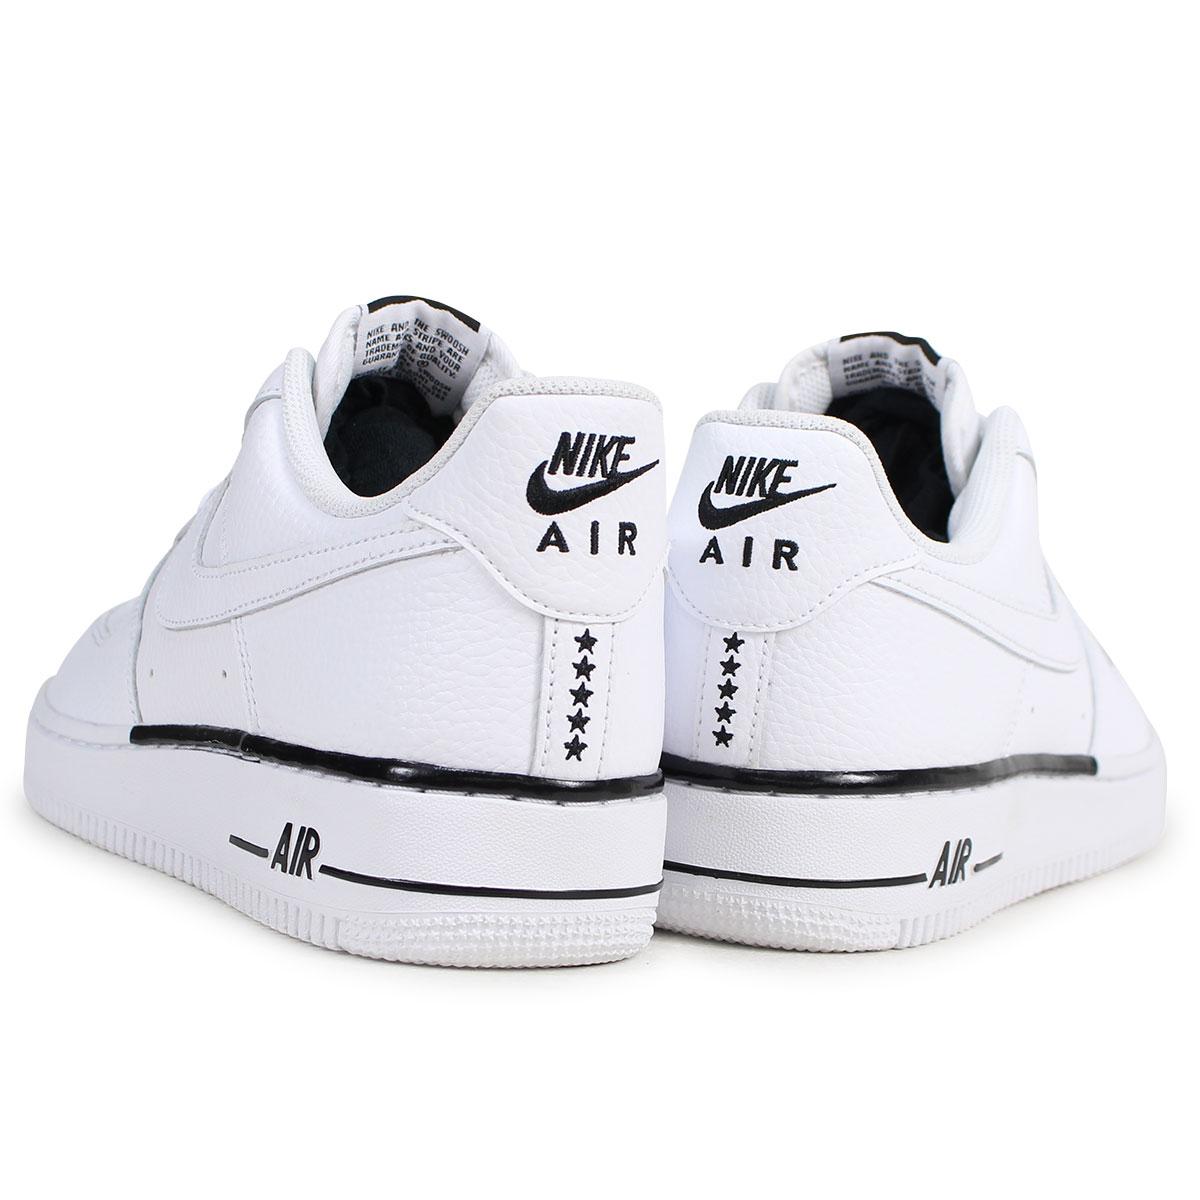 07 NIKE AIR FORCE 1 Nike air force 1 sneakers men AA4083 101 white